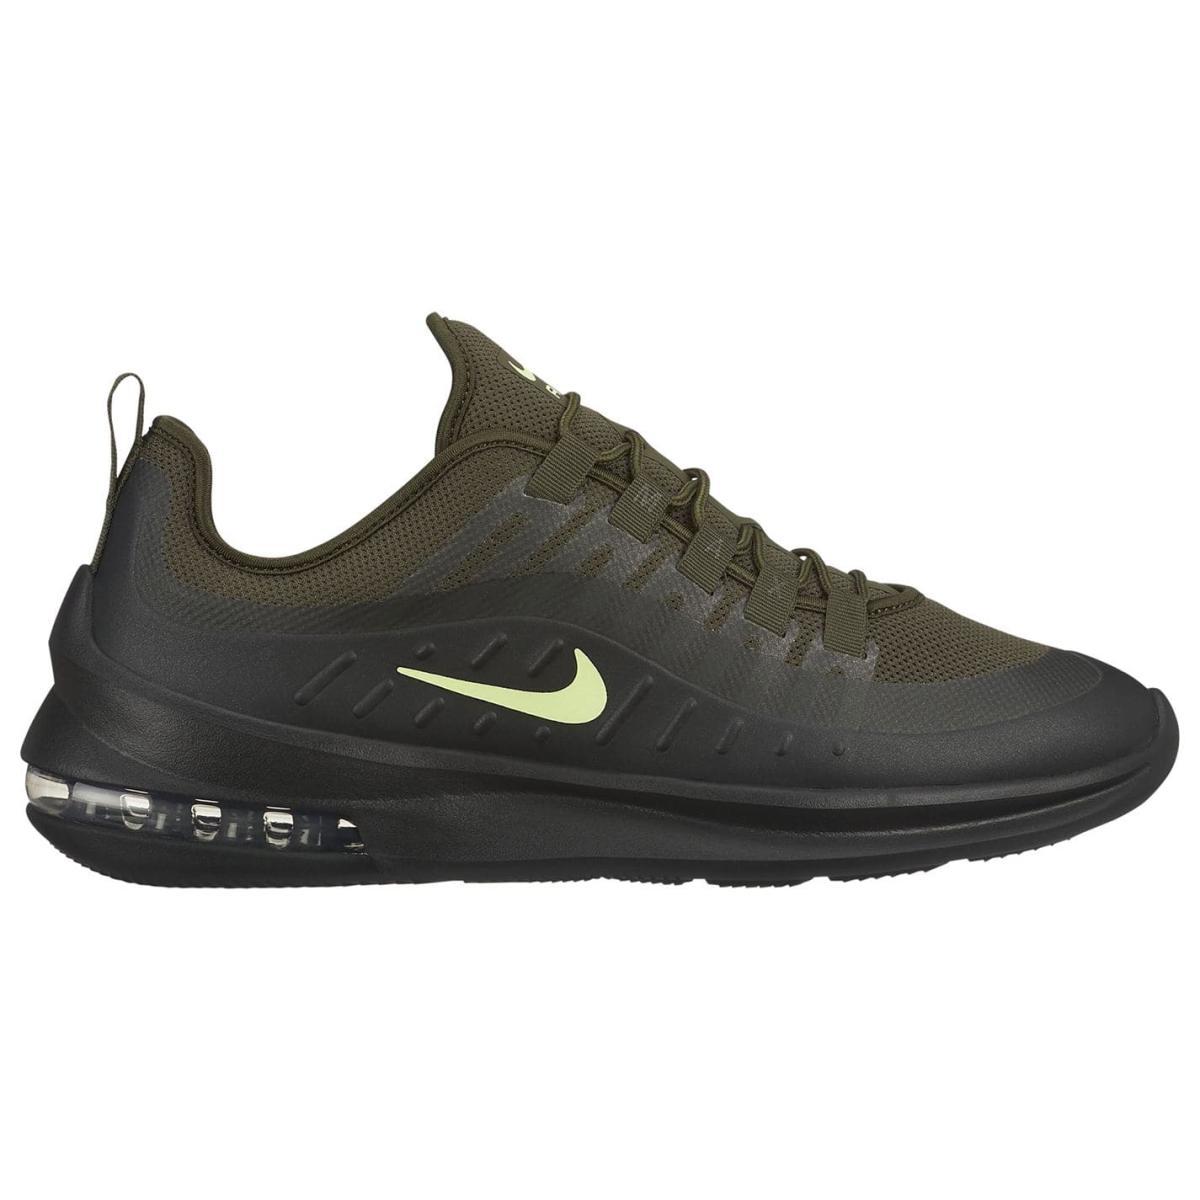 Nike Air Max Axis Turnschuhe Sportschuhe Herren Khaki_Volt